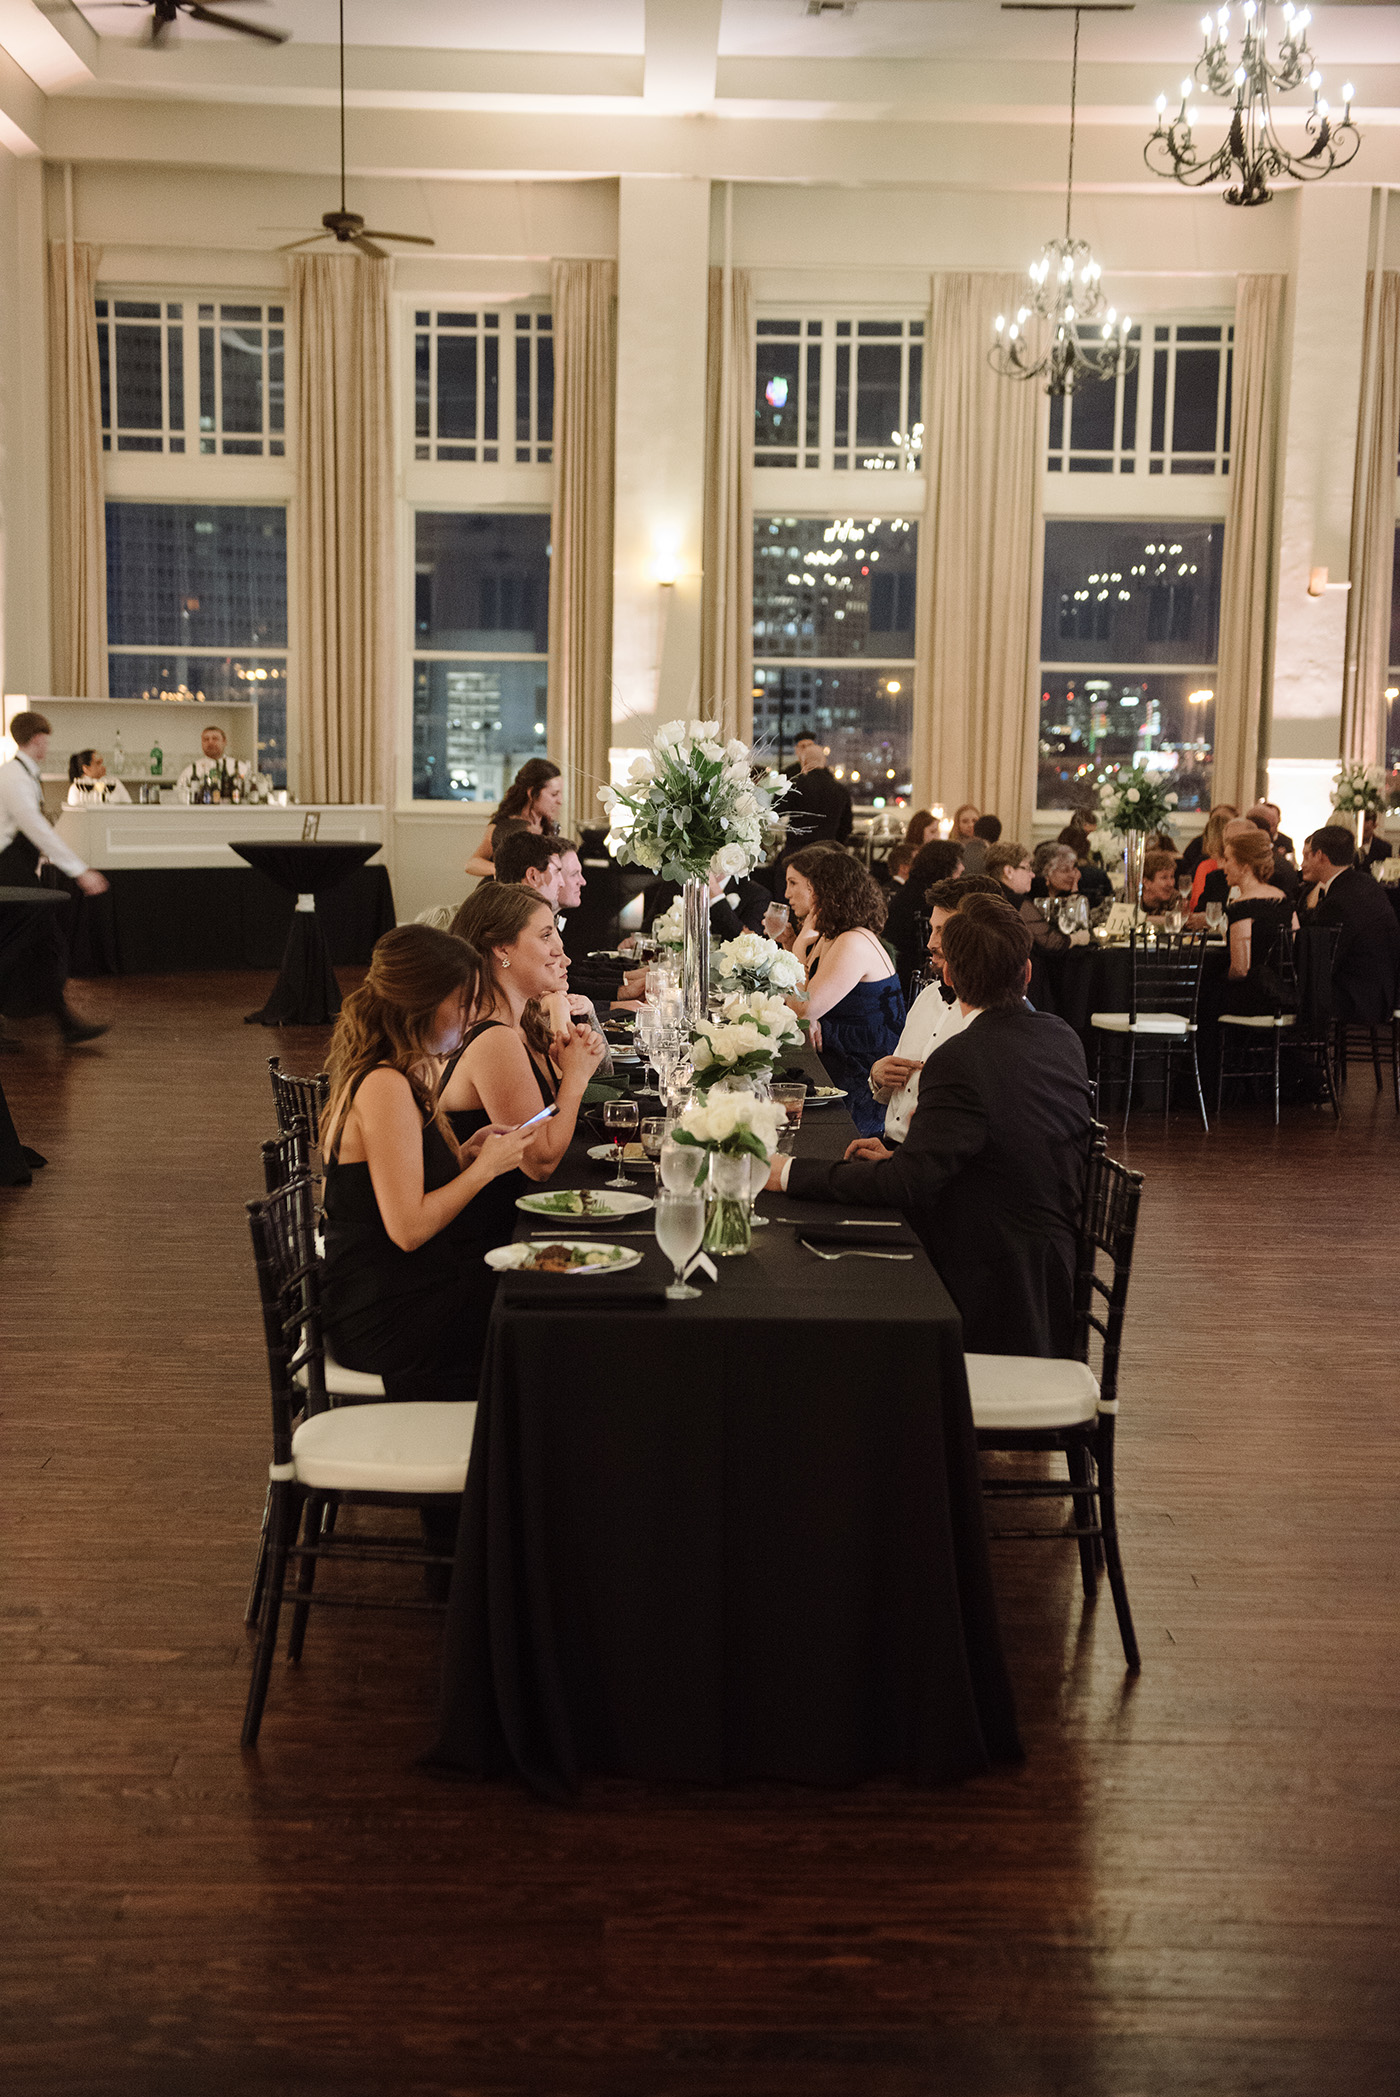 Dallas Wedding Planner - Winter Wedding at The Room on Main - Allday Events - 105.jpg